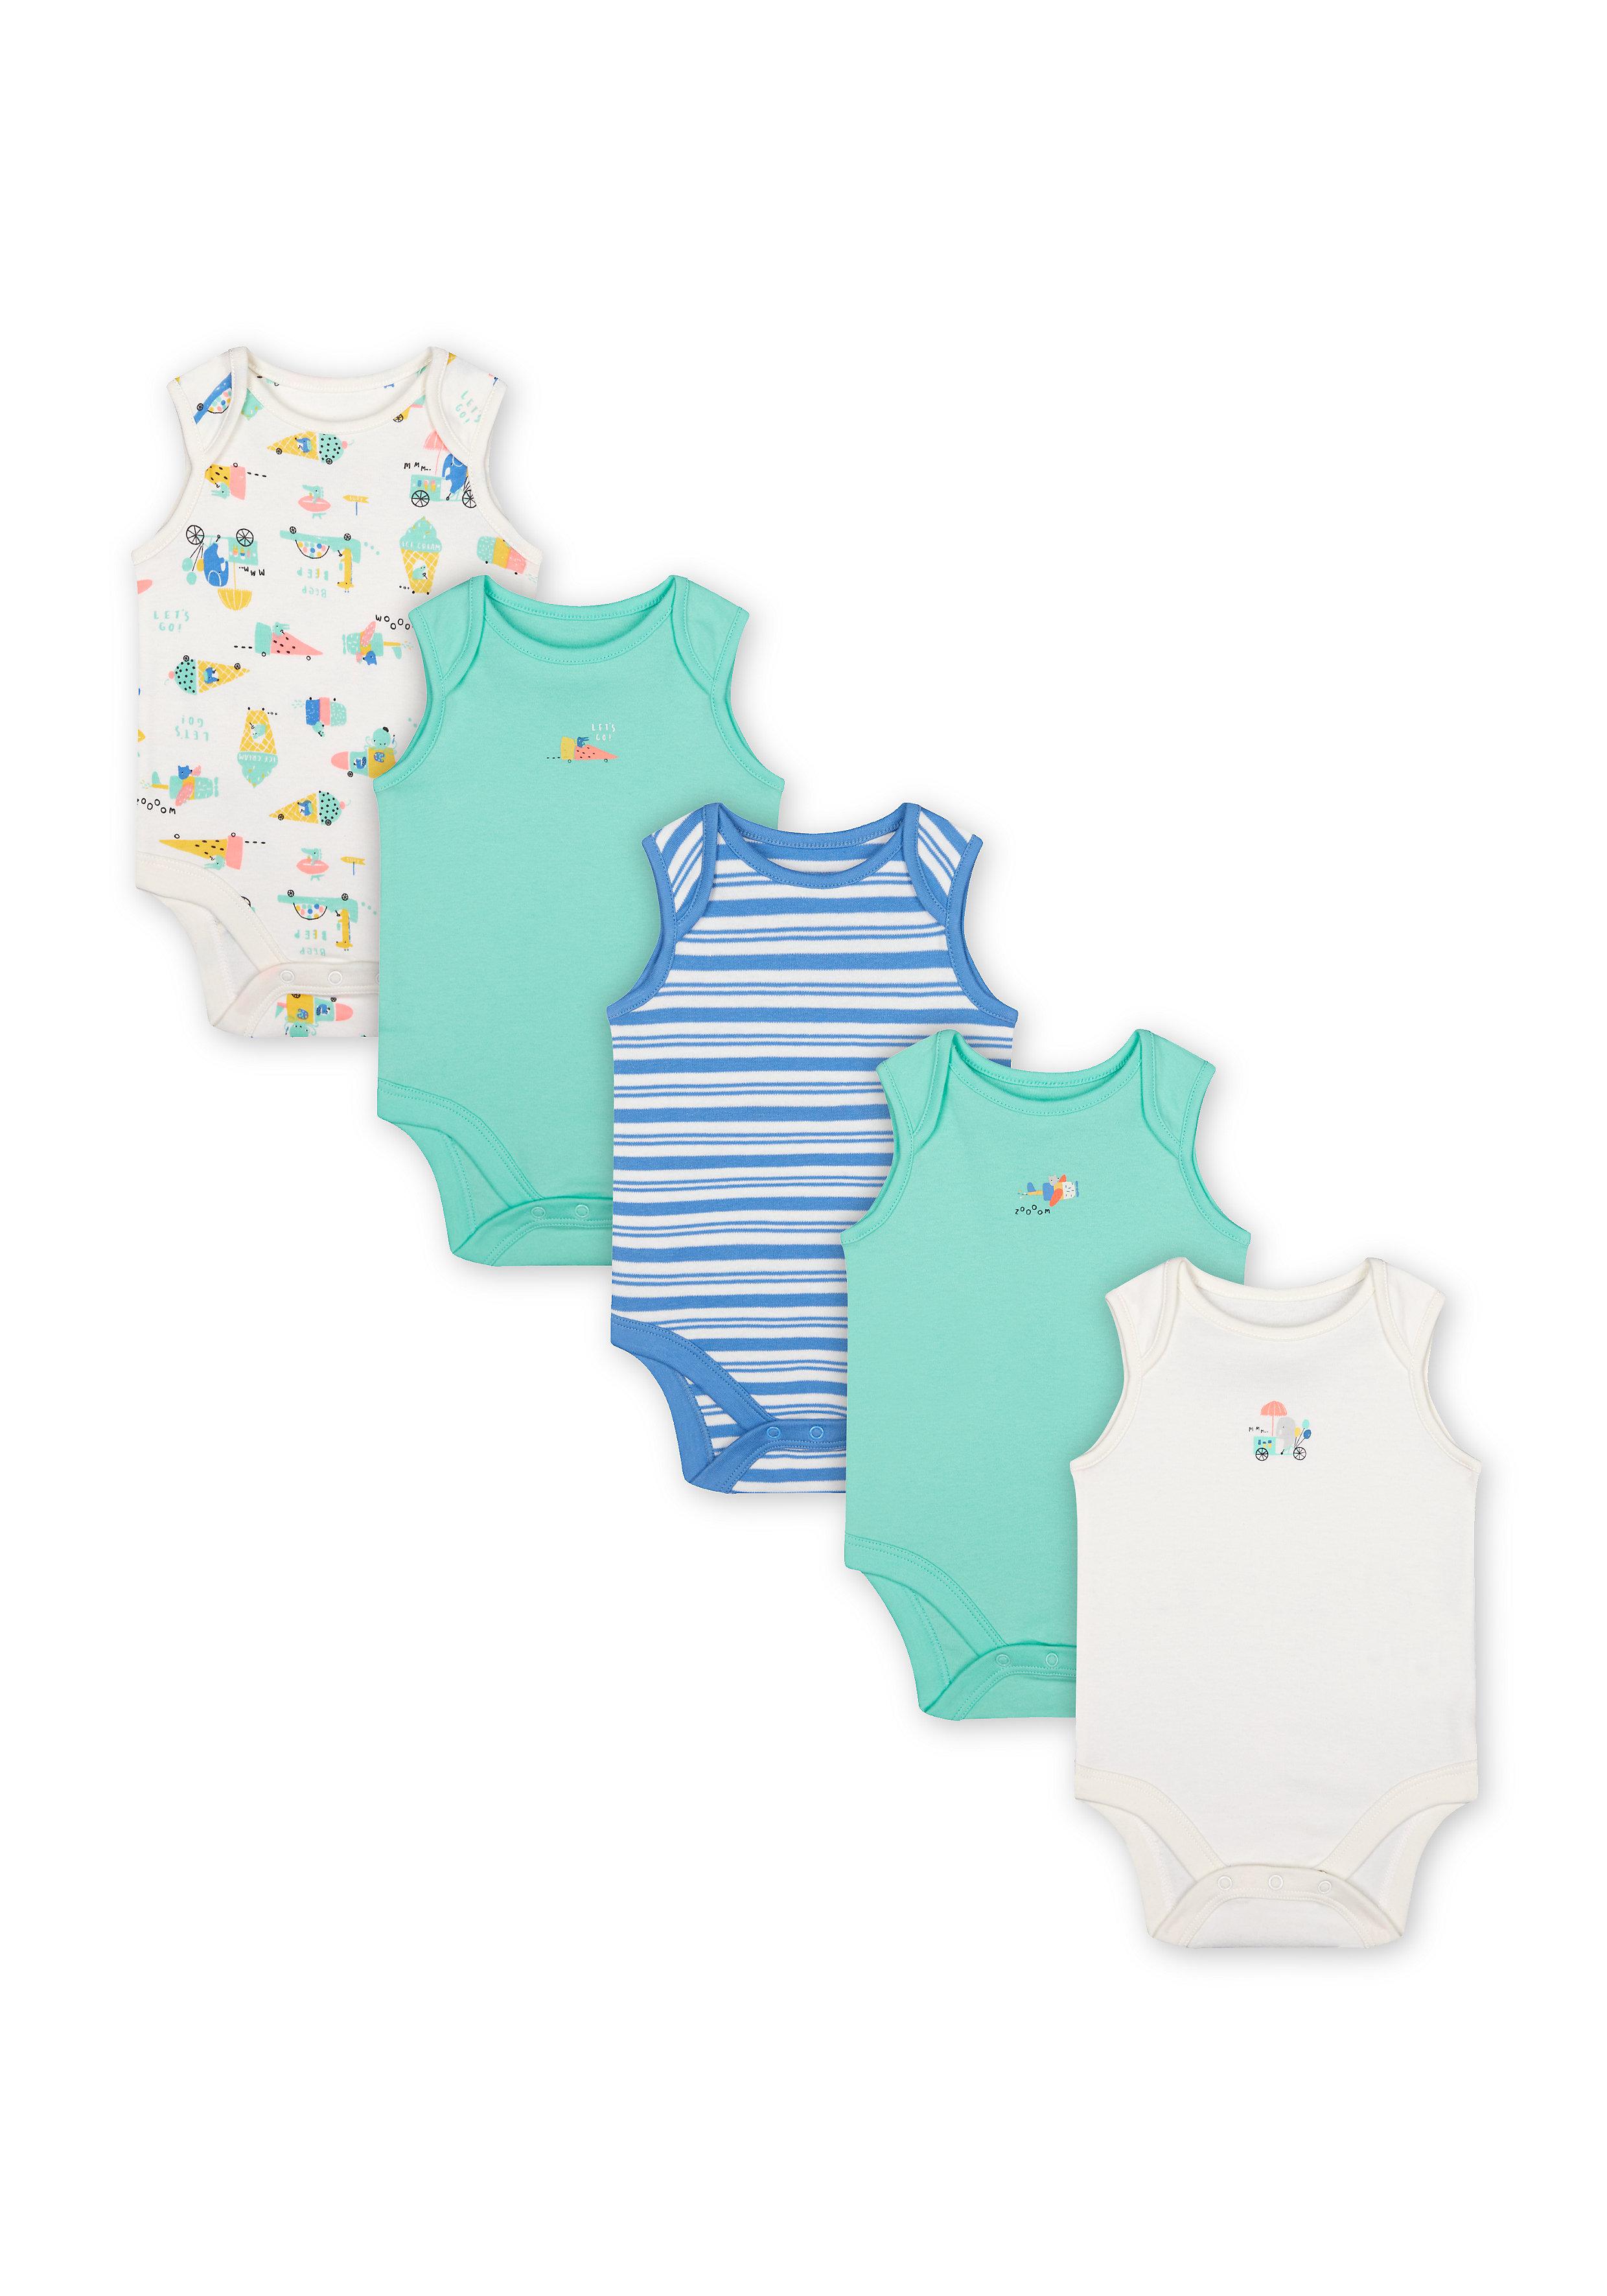 Mothercare | Boys Sleeveless Bodysuit Stripes And Ice Cream Print - Pack Of 5 - Green Blue White